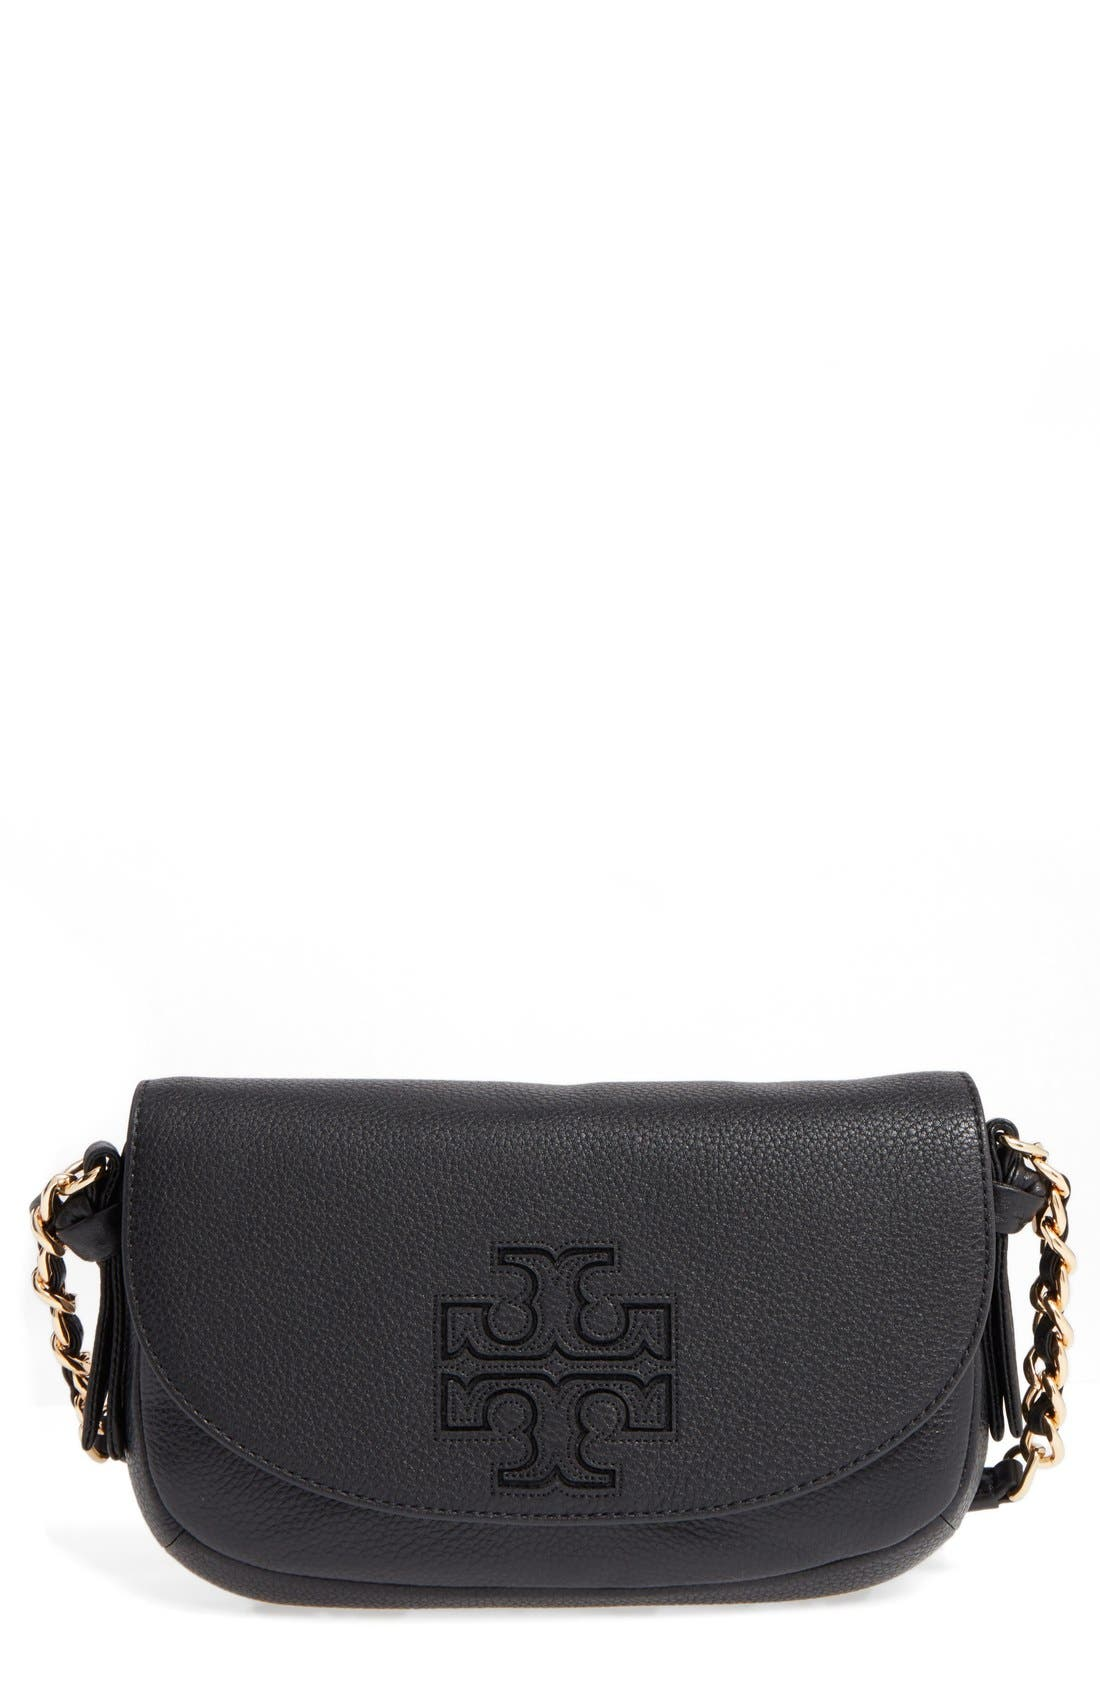 Alternate Image 1 Selected - Tory Burch Mini Harper Leather Crossbody Bag